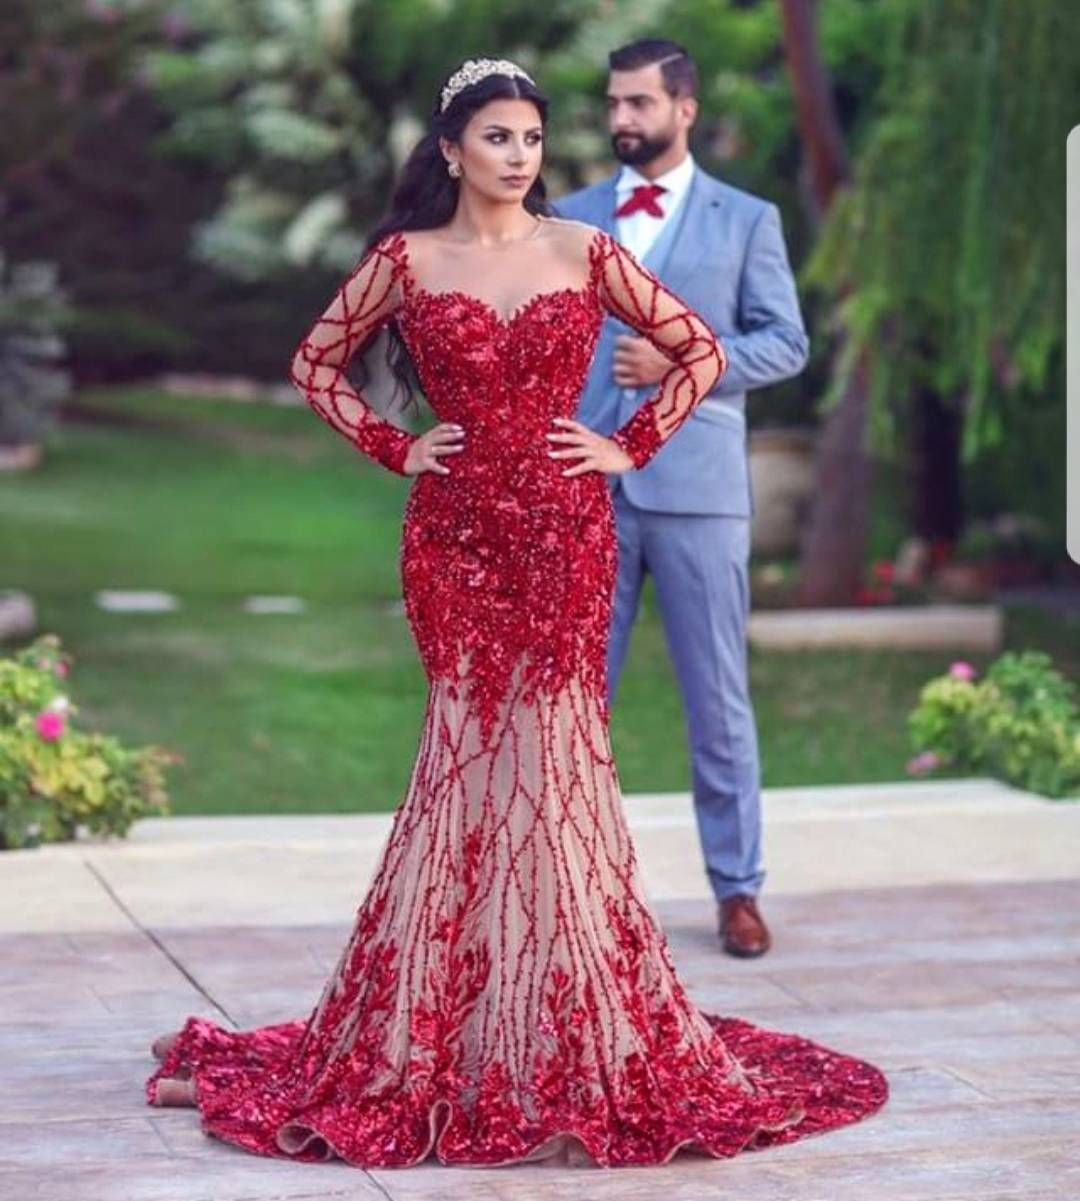 Custom Dresses Inspired By Haute Couture Designer Evening Fashion Haute Couture Wedding Dress Dresses Custom Dresses